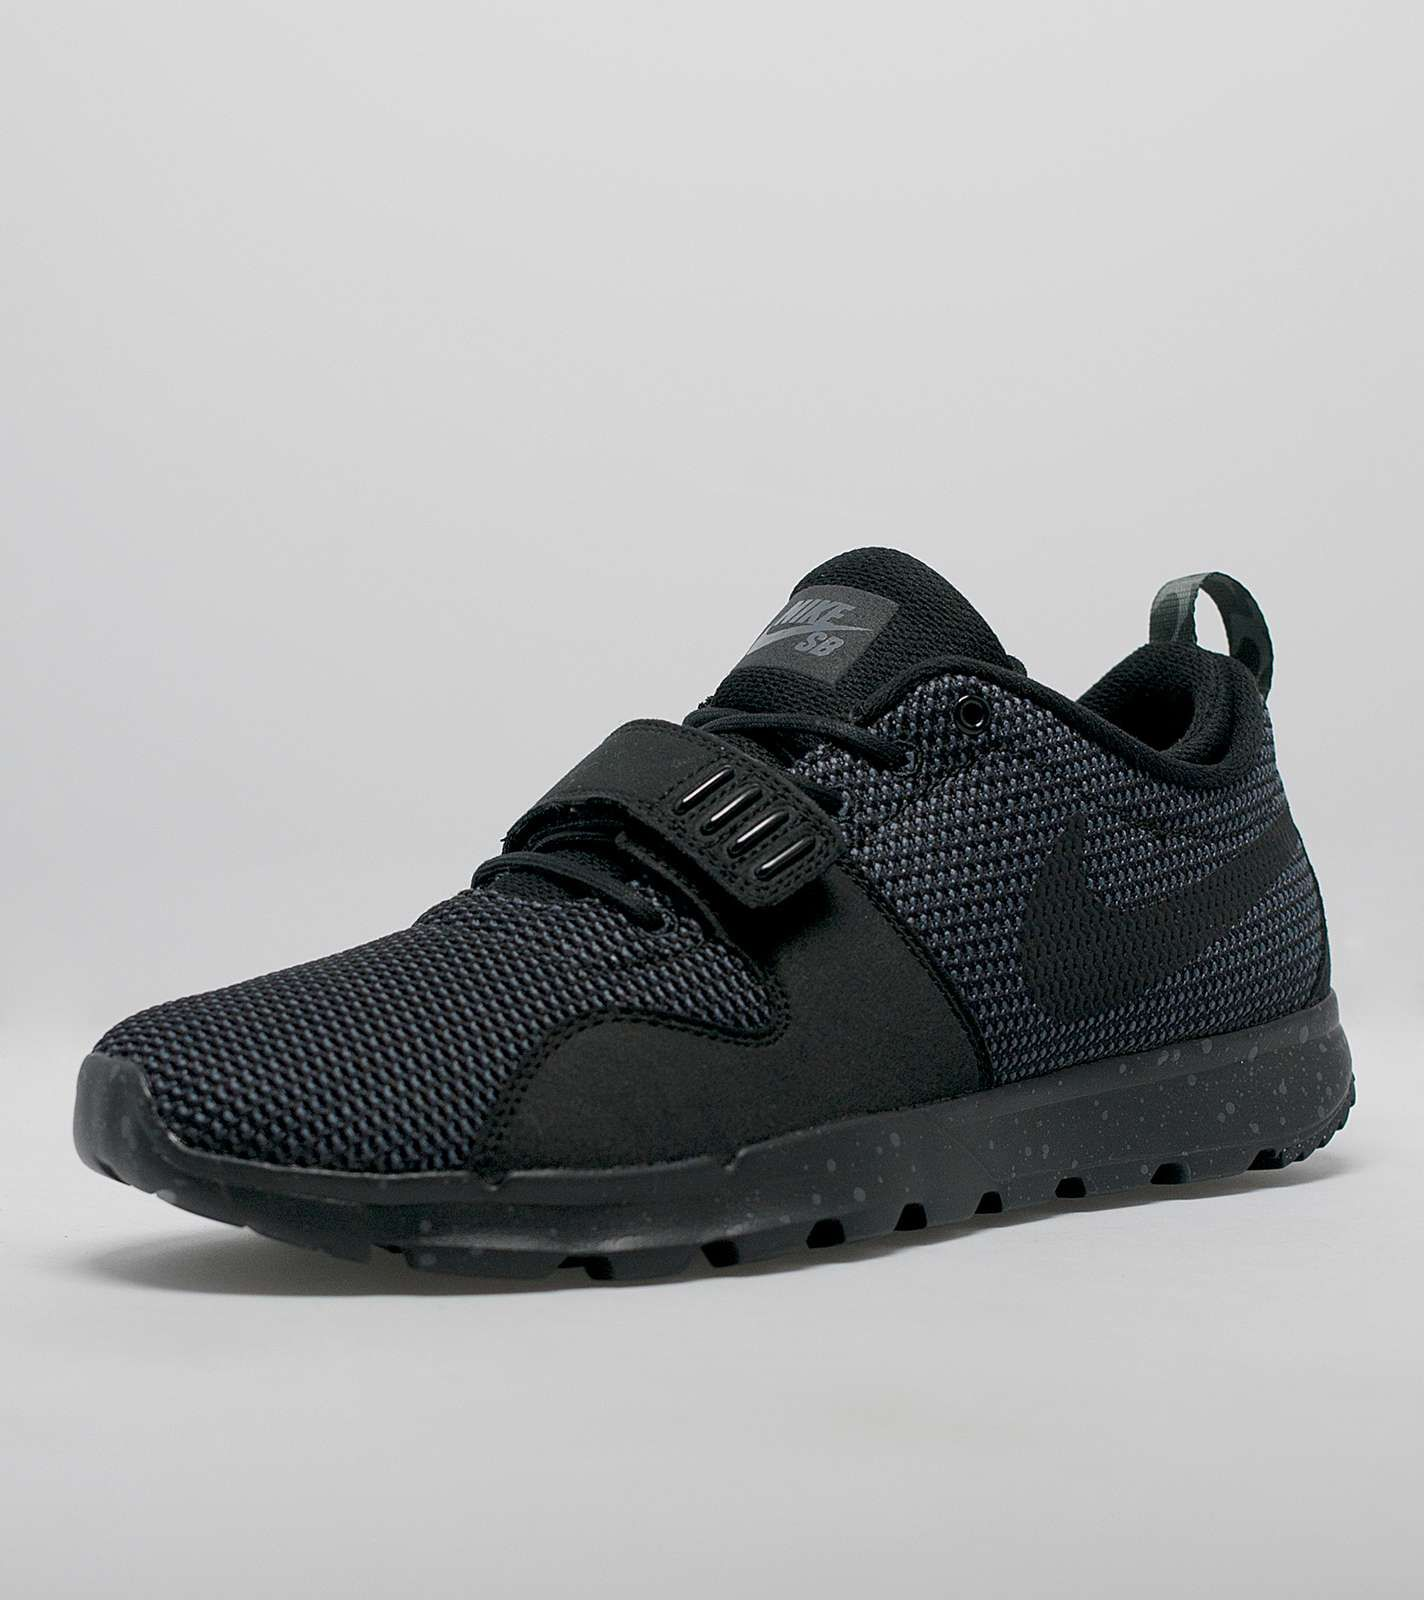 online store 748d6 11f46 Nike SB Trainerendor